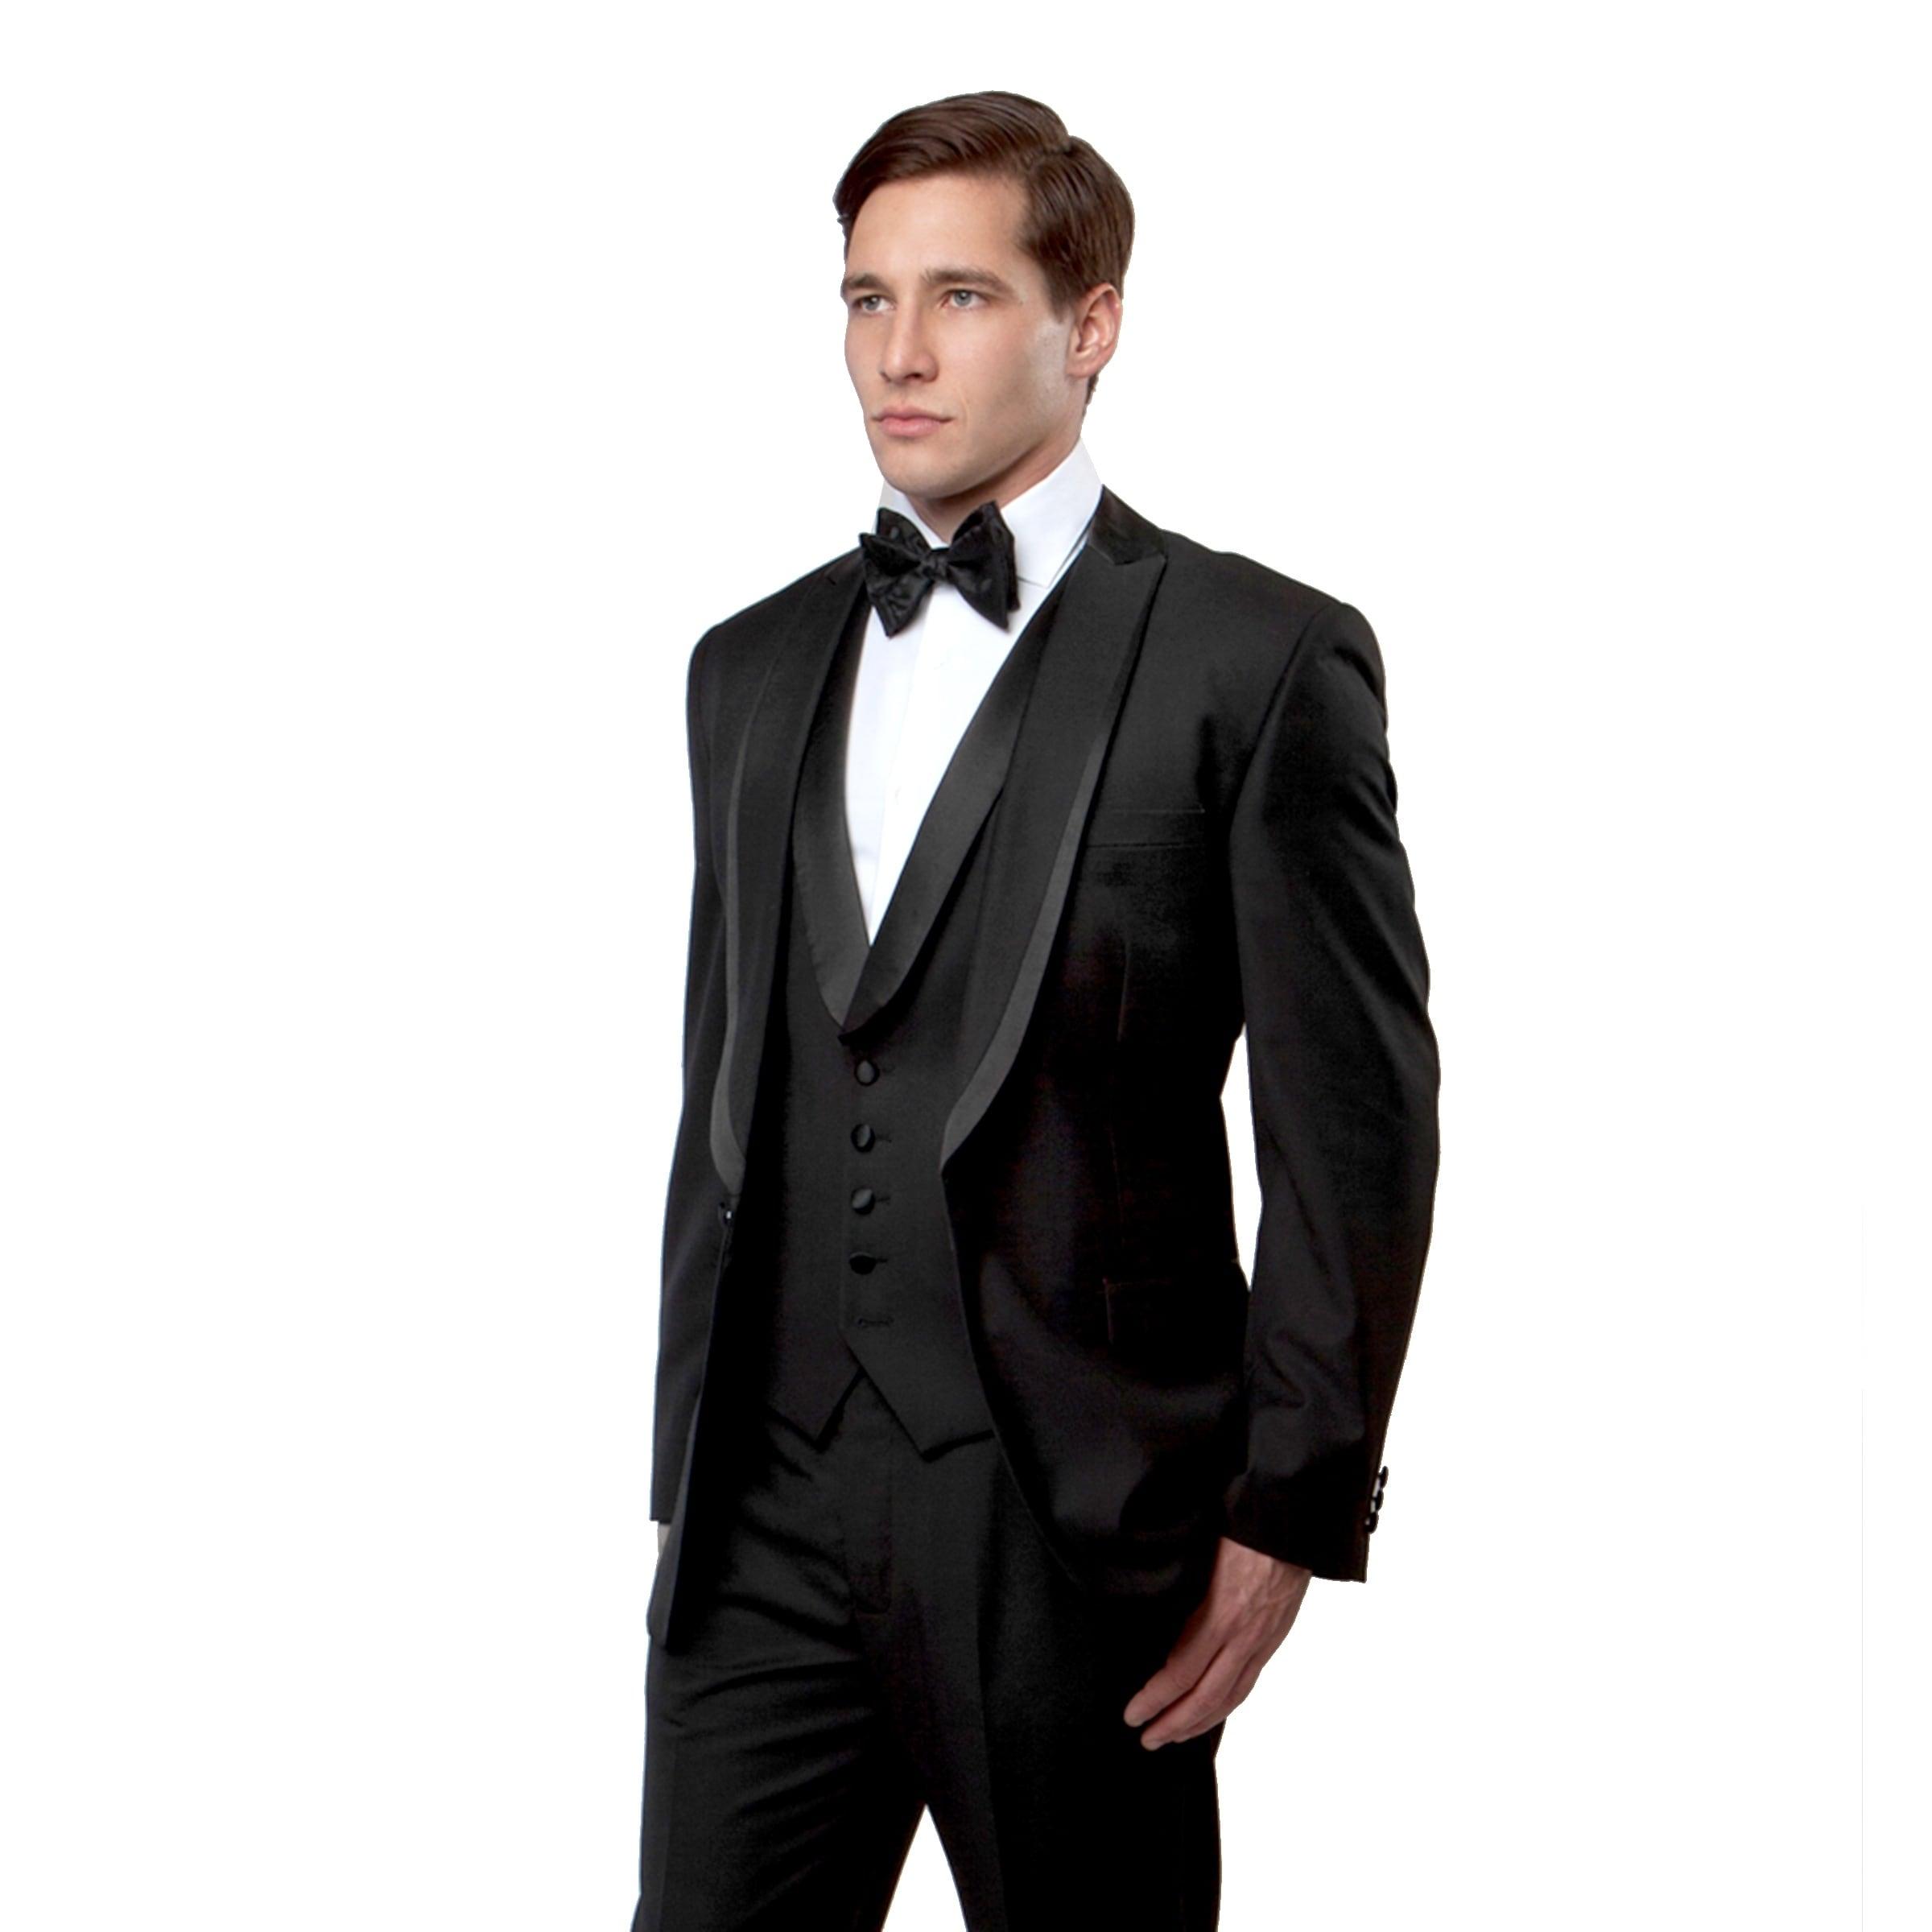 Men/'s Red Classic Fit Formal Tuxedo Suit w// Black Sateen Lapel /& Trim NEW